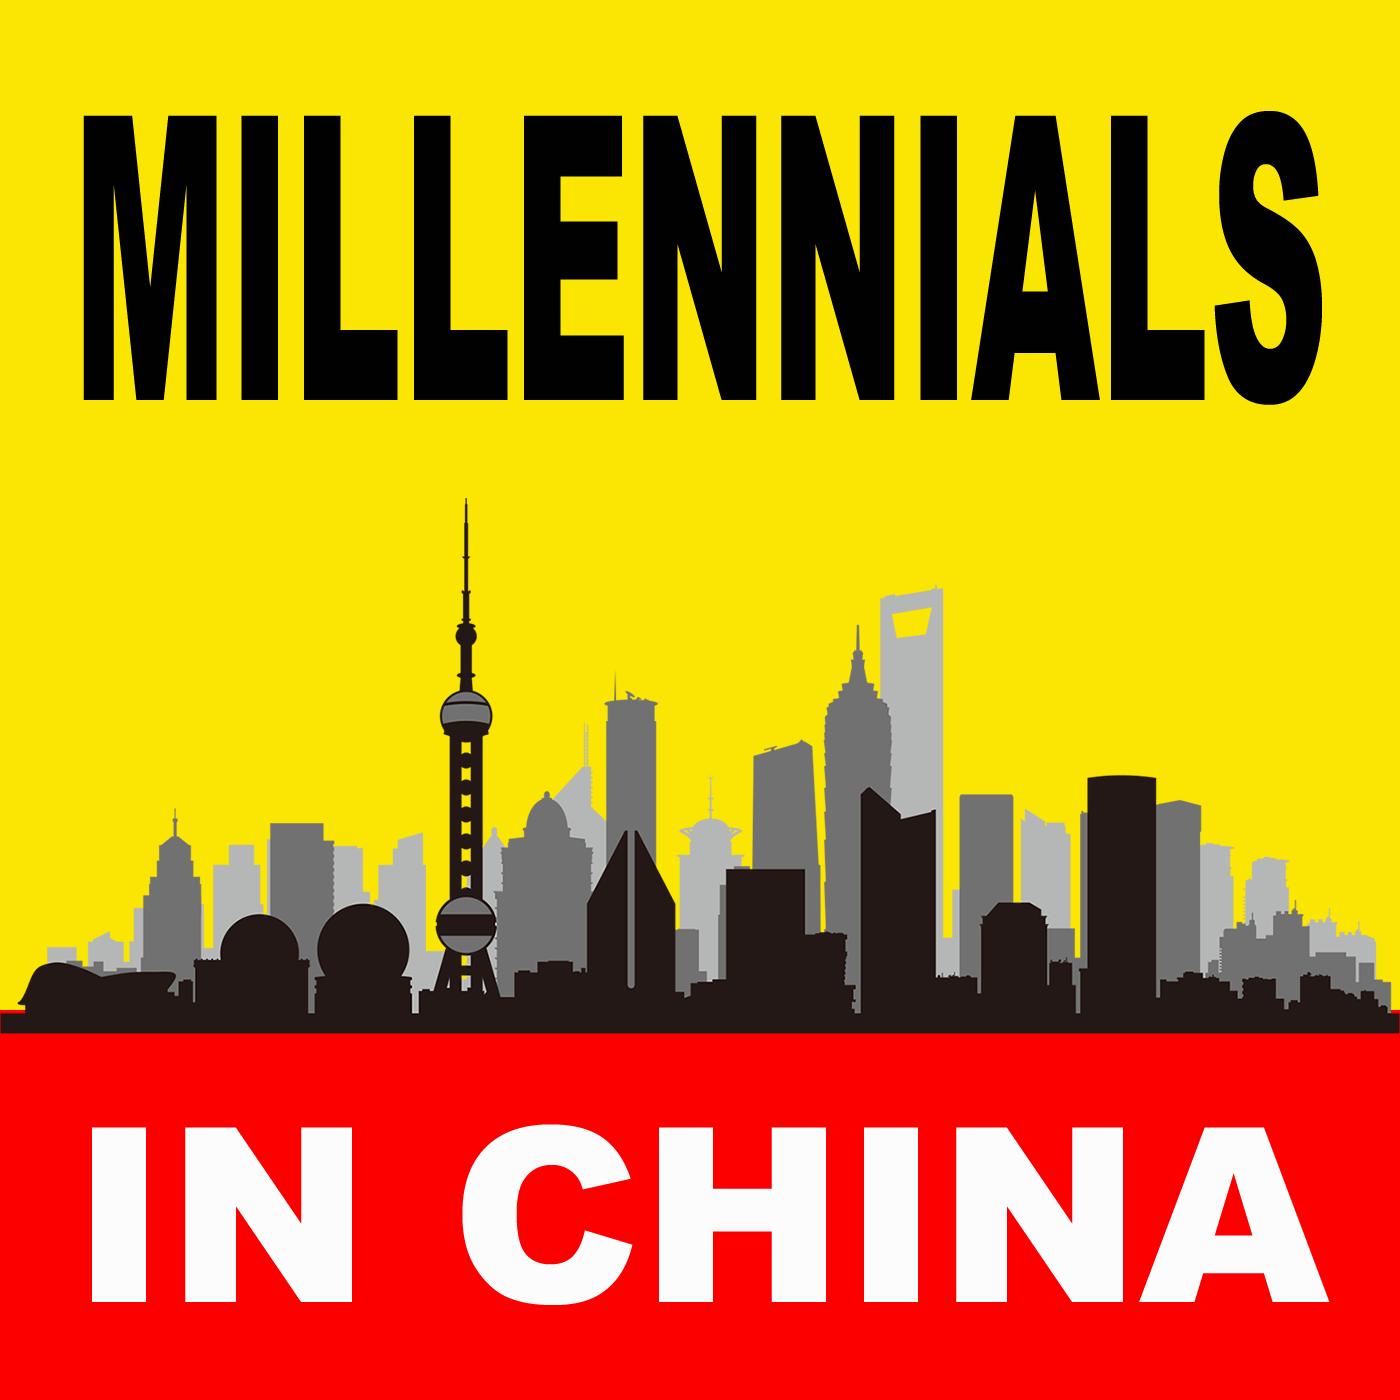 EP20: Multinational Companies and Expat Football Clubs ft. Henrik Kragh